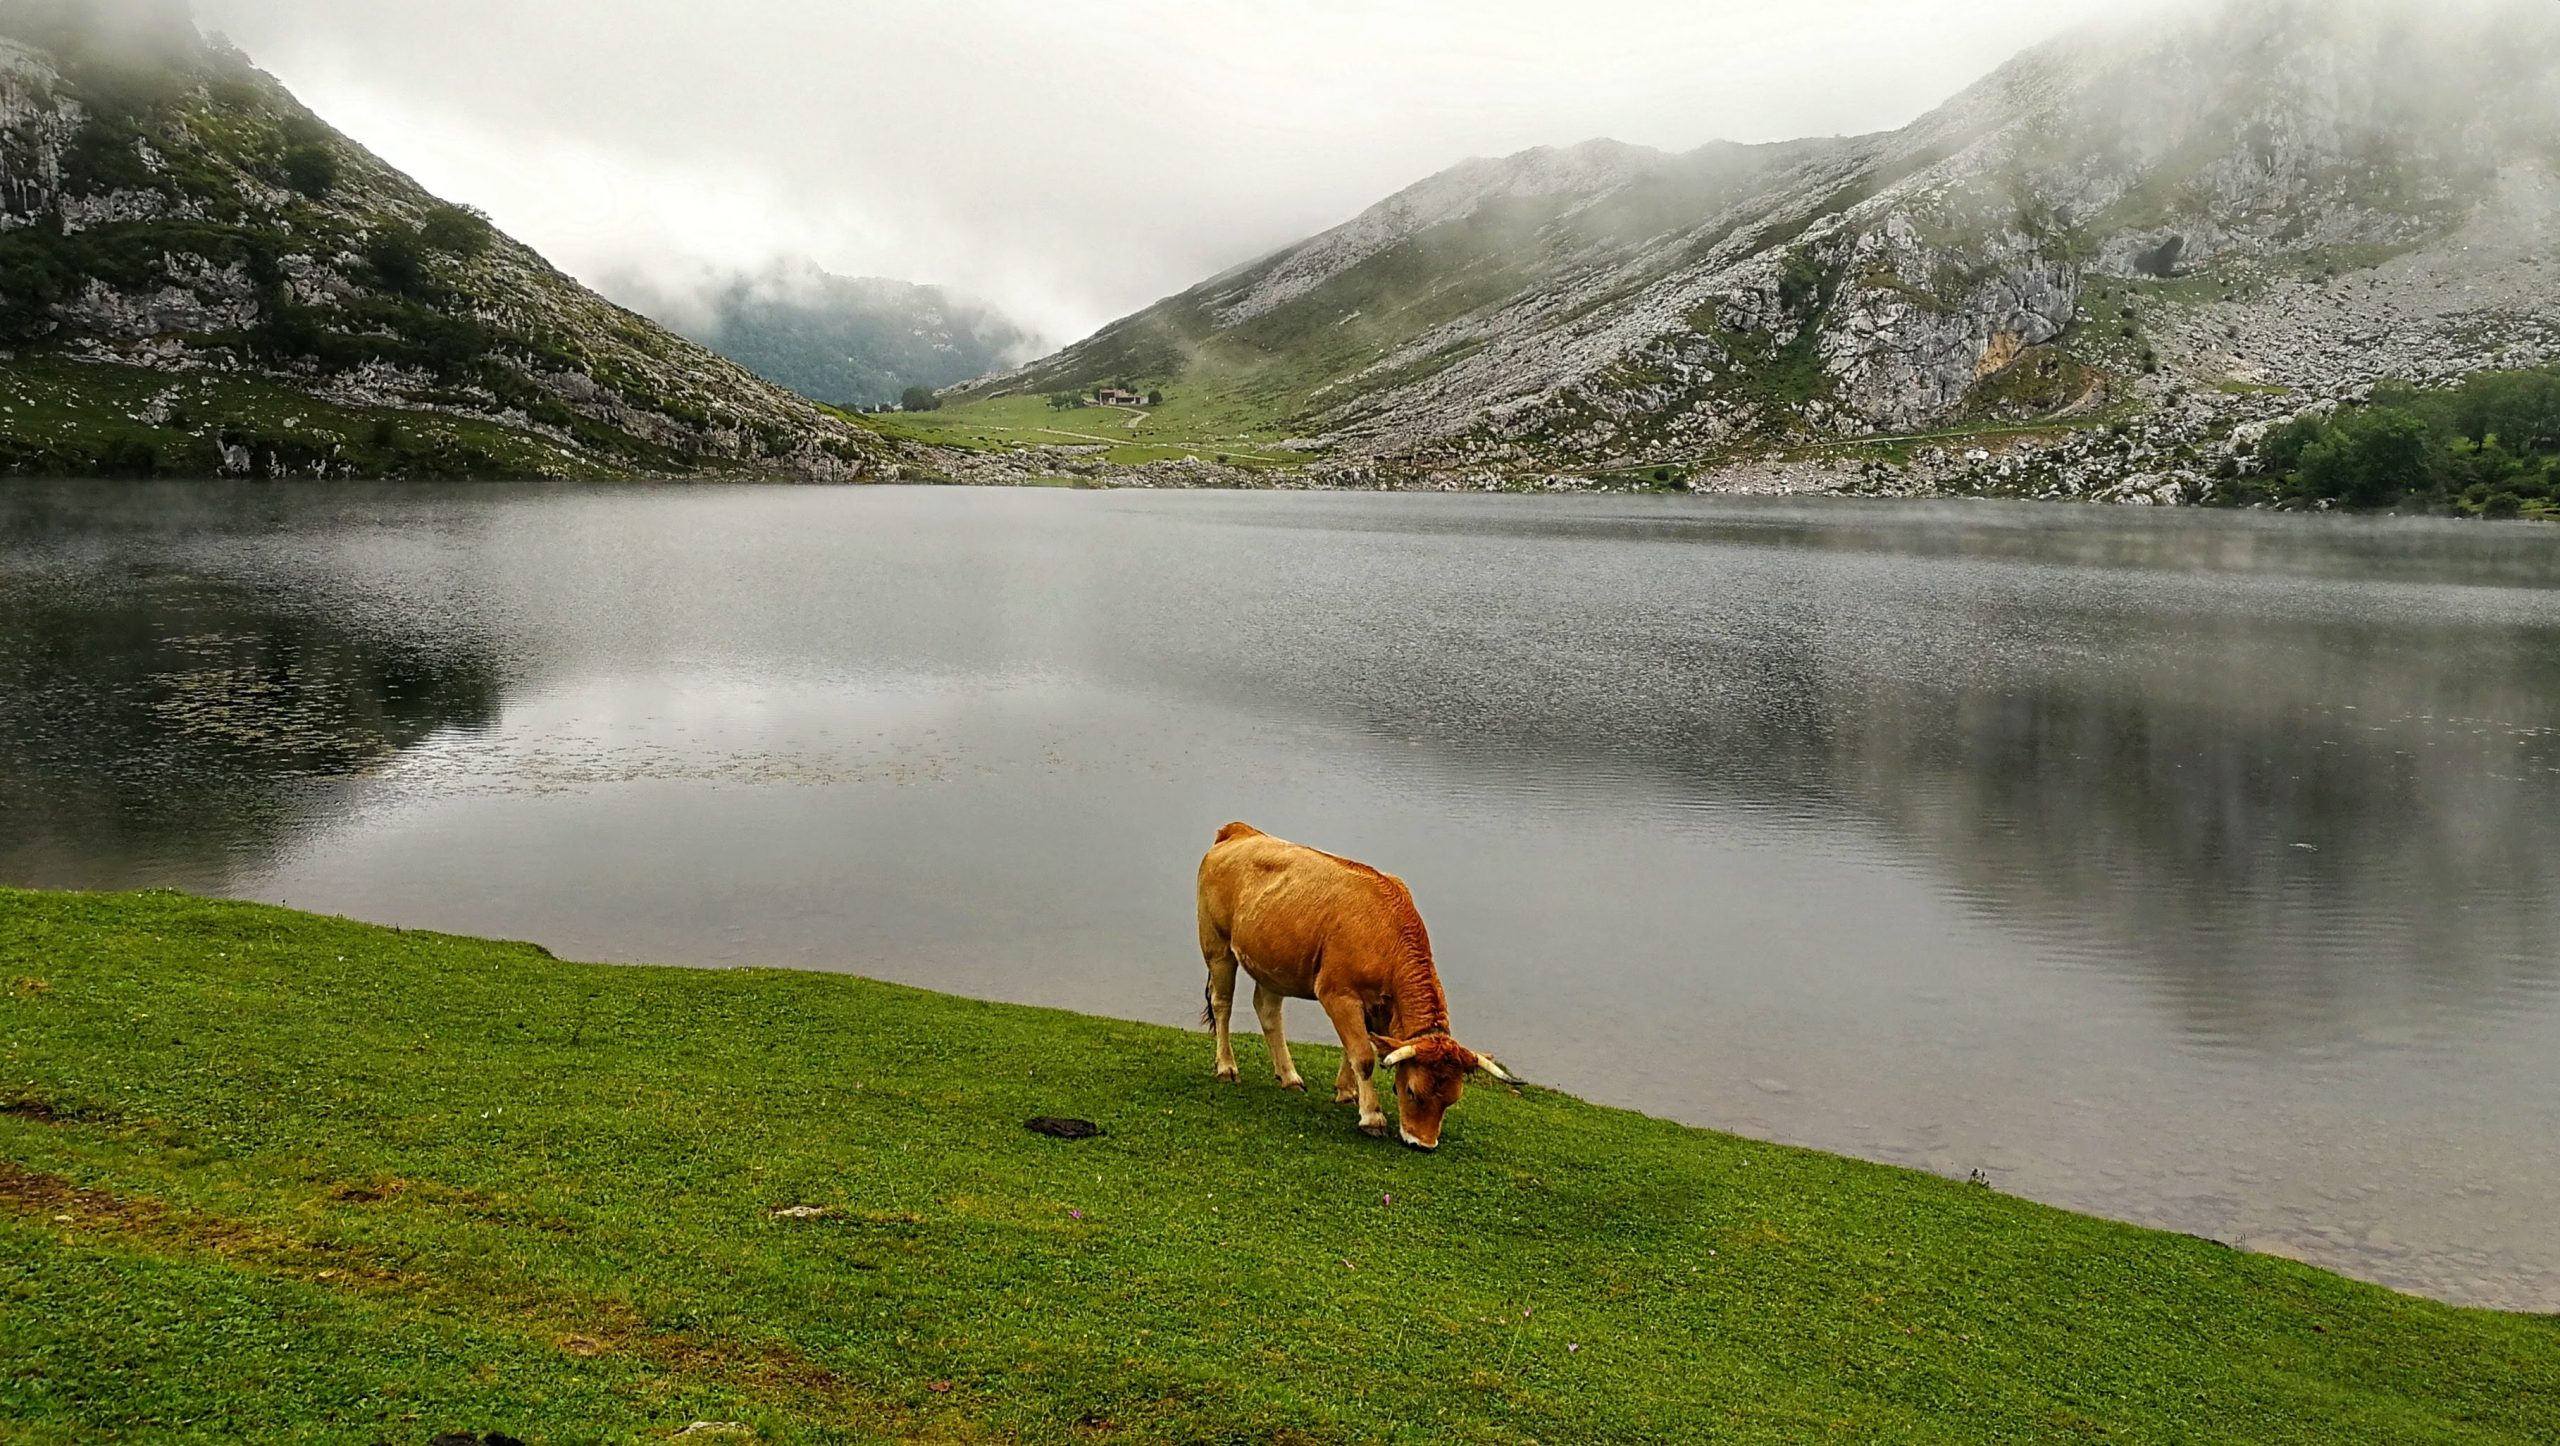 lagos de covadonga familias numerosas